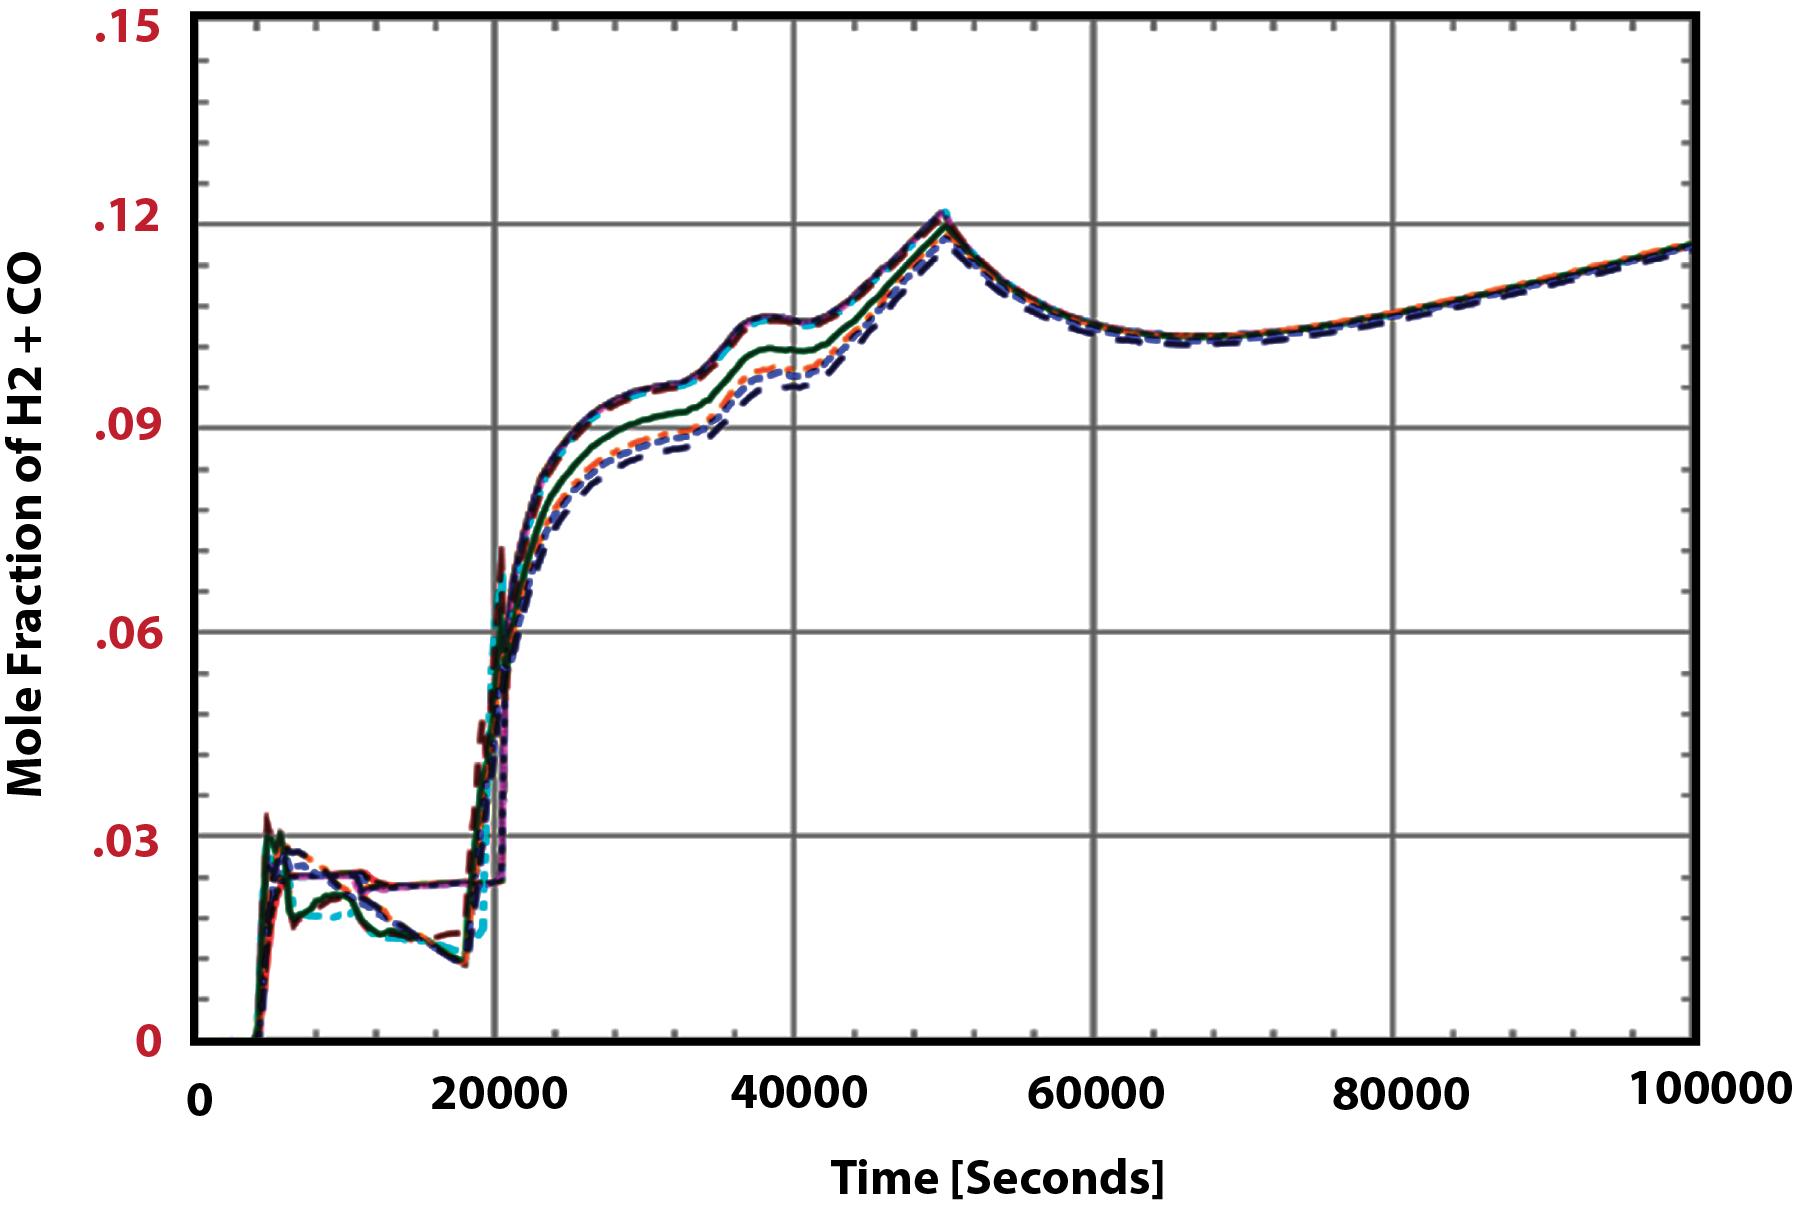 Figure 6 H2+CO Distribution